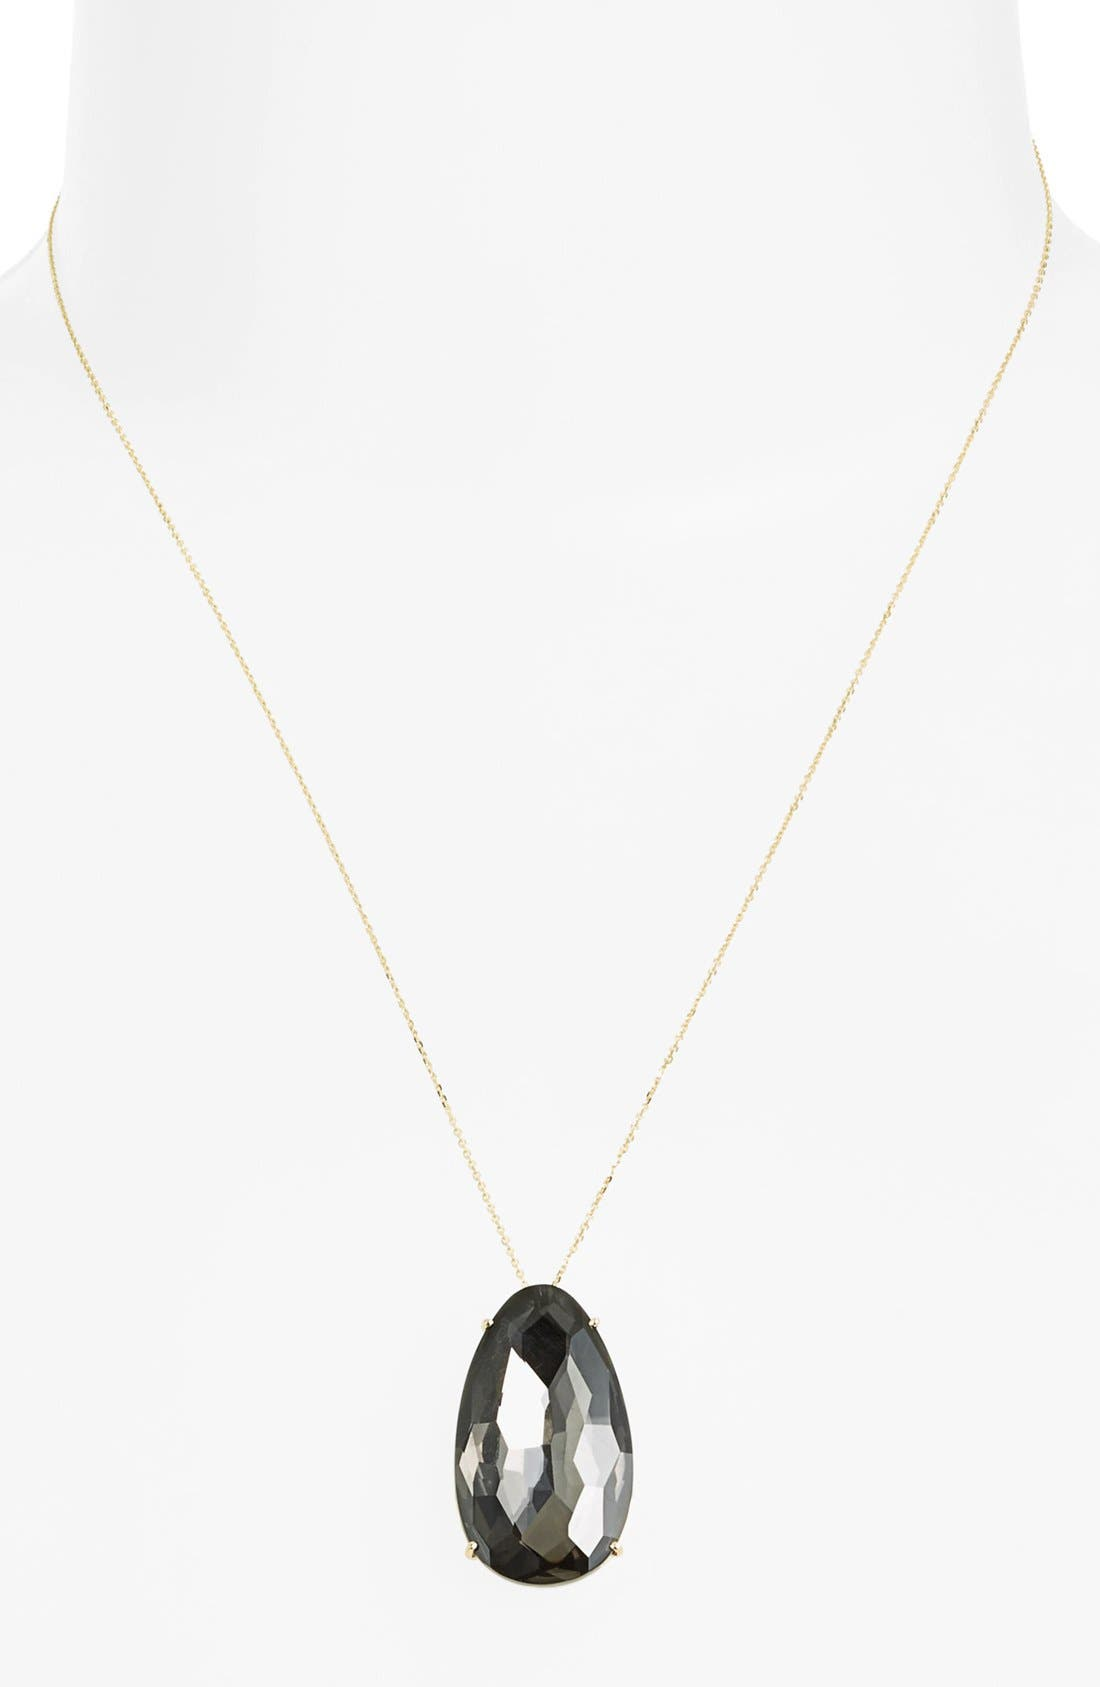 Alternate Image 1 Selected - KALAN by Suzanne Kalan Stone Pendant Necklace